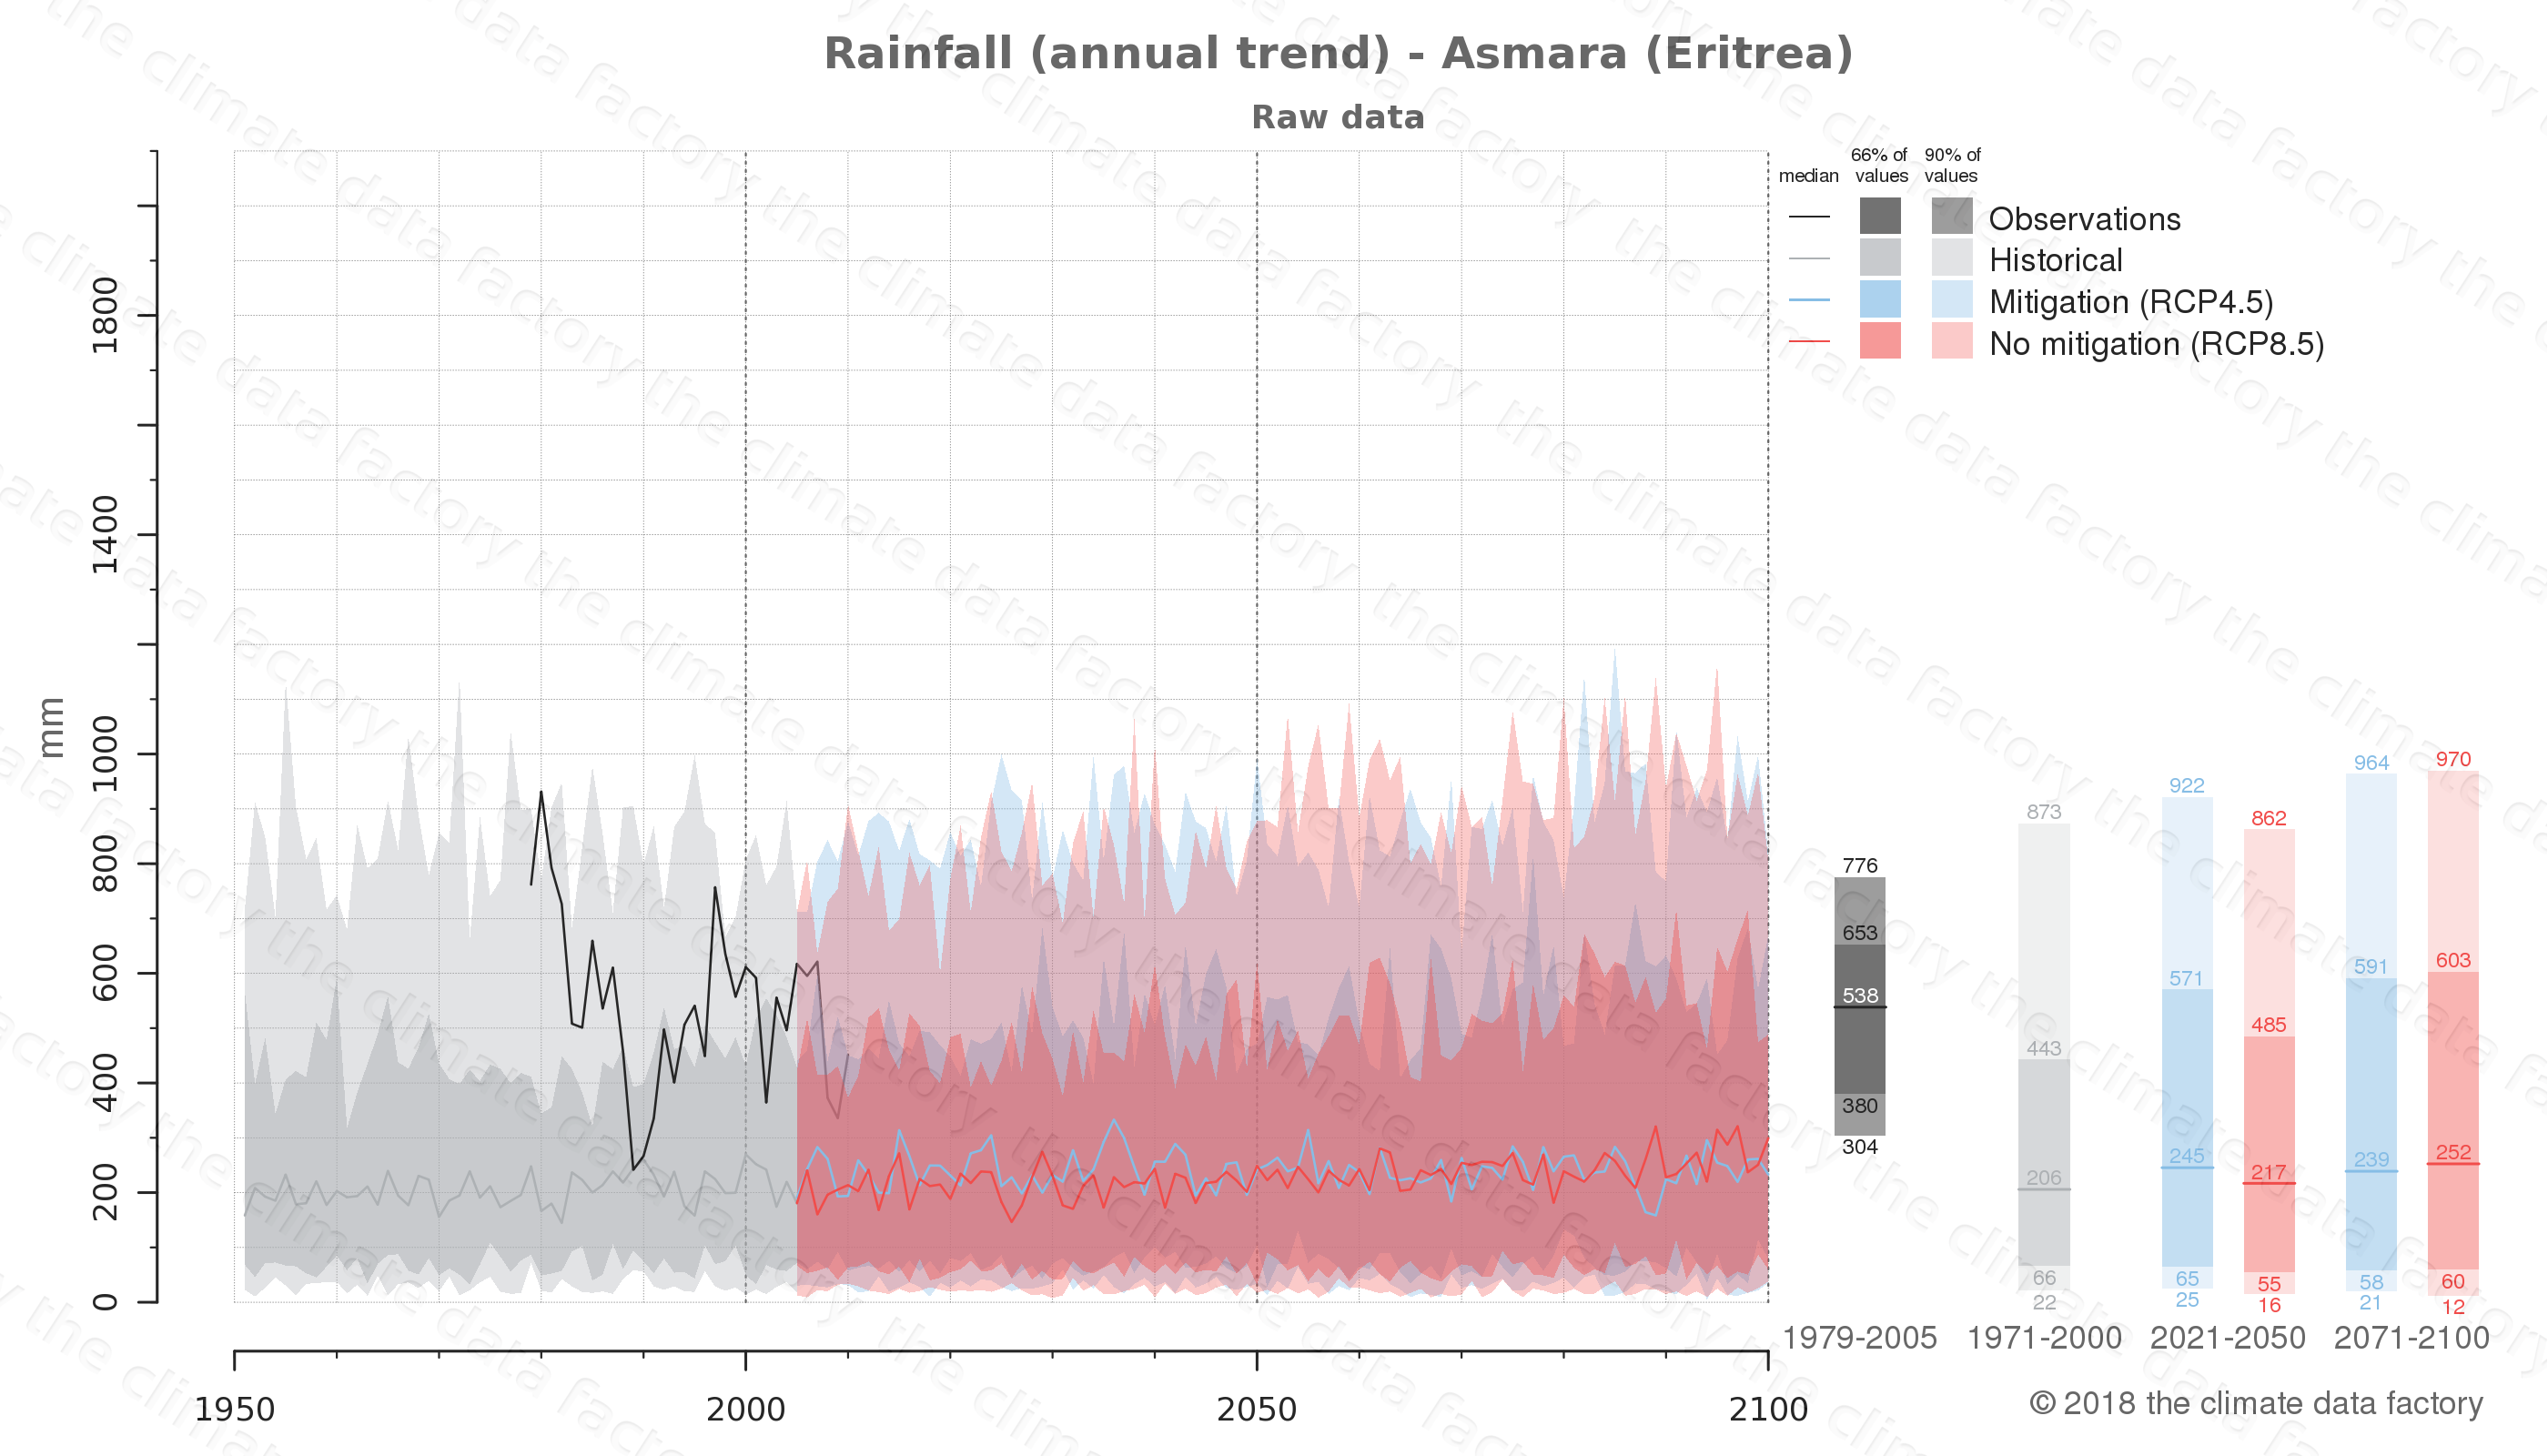 climate change data policy adaptation climate graph city data rainfall asmara eritrea